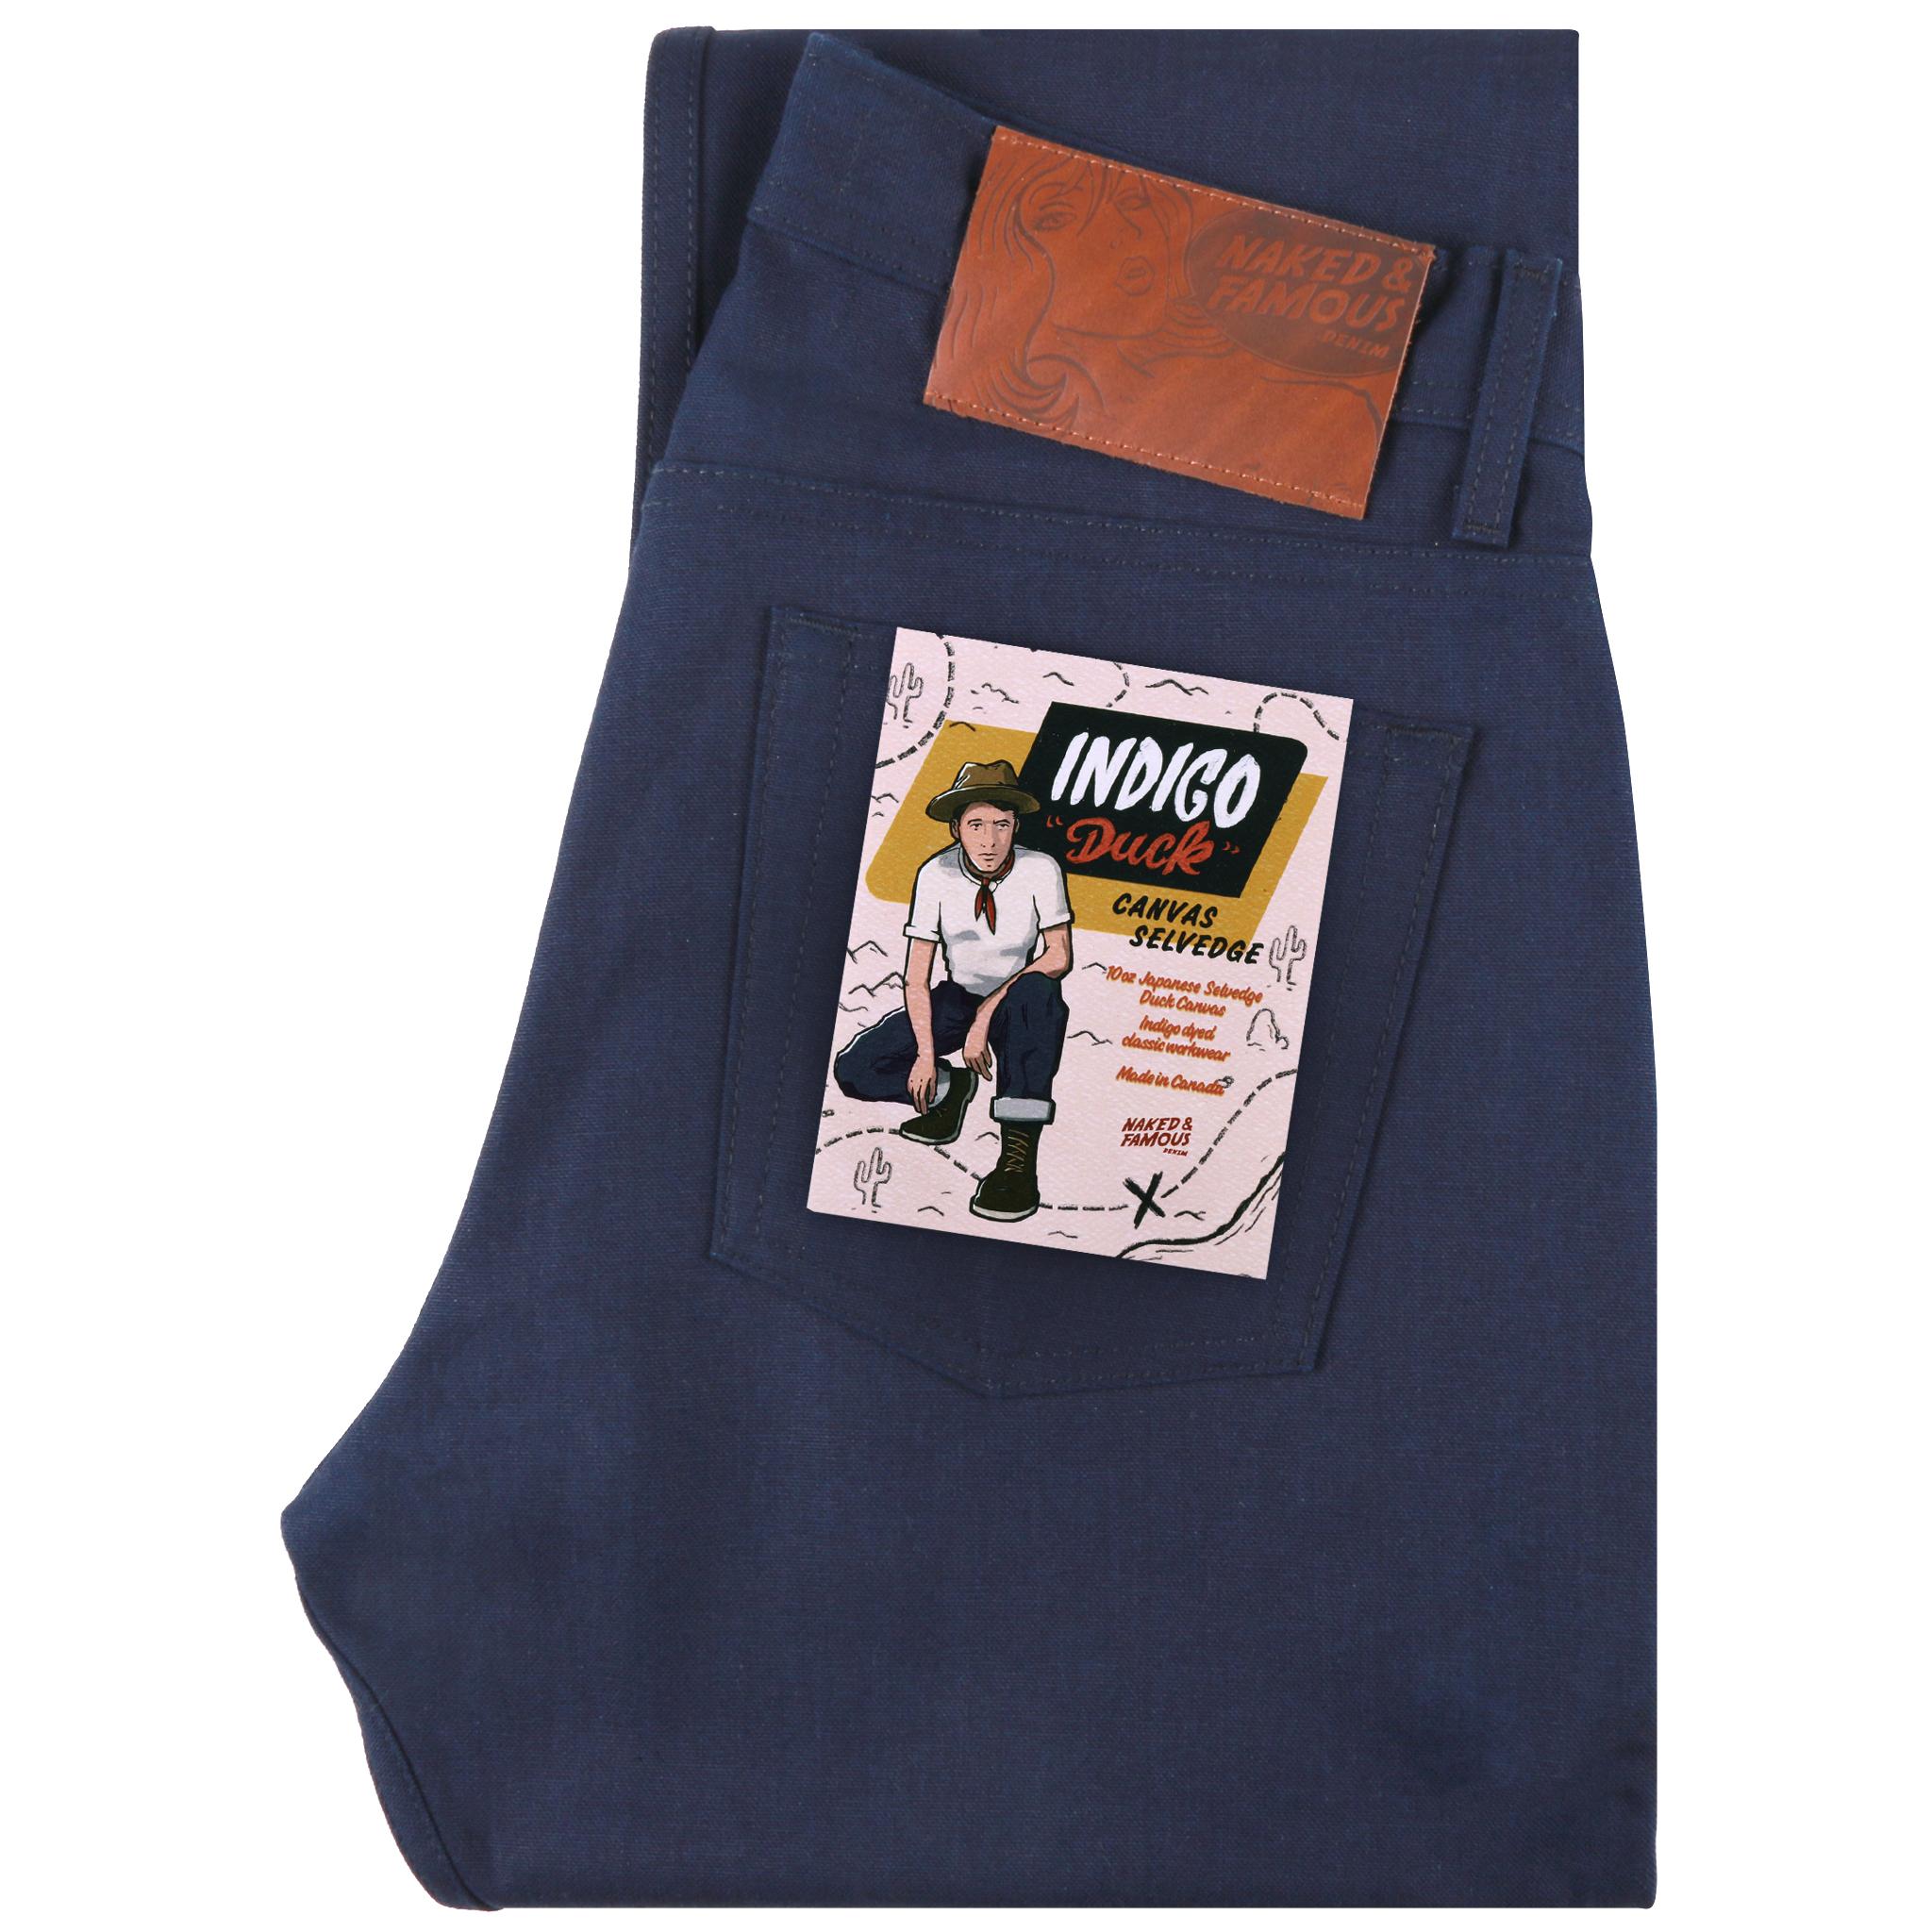 Indigo Duck Canvas Selvedge jeans folded